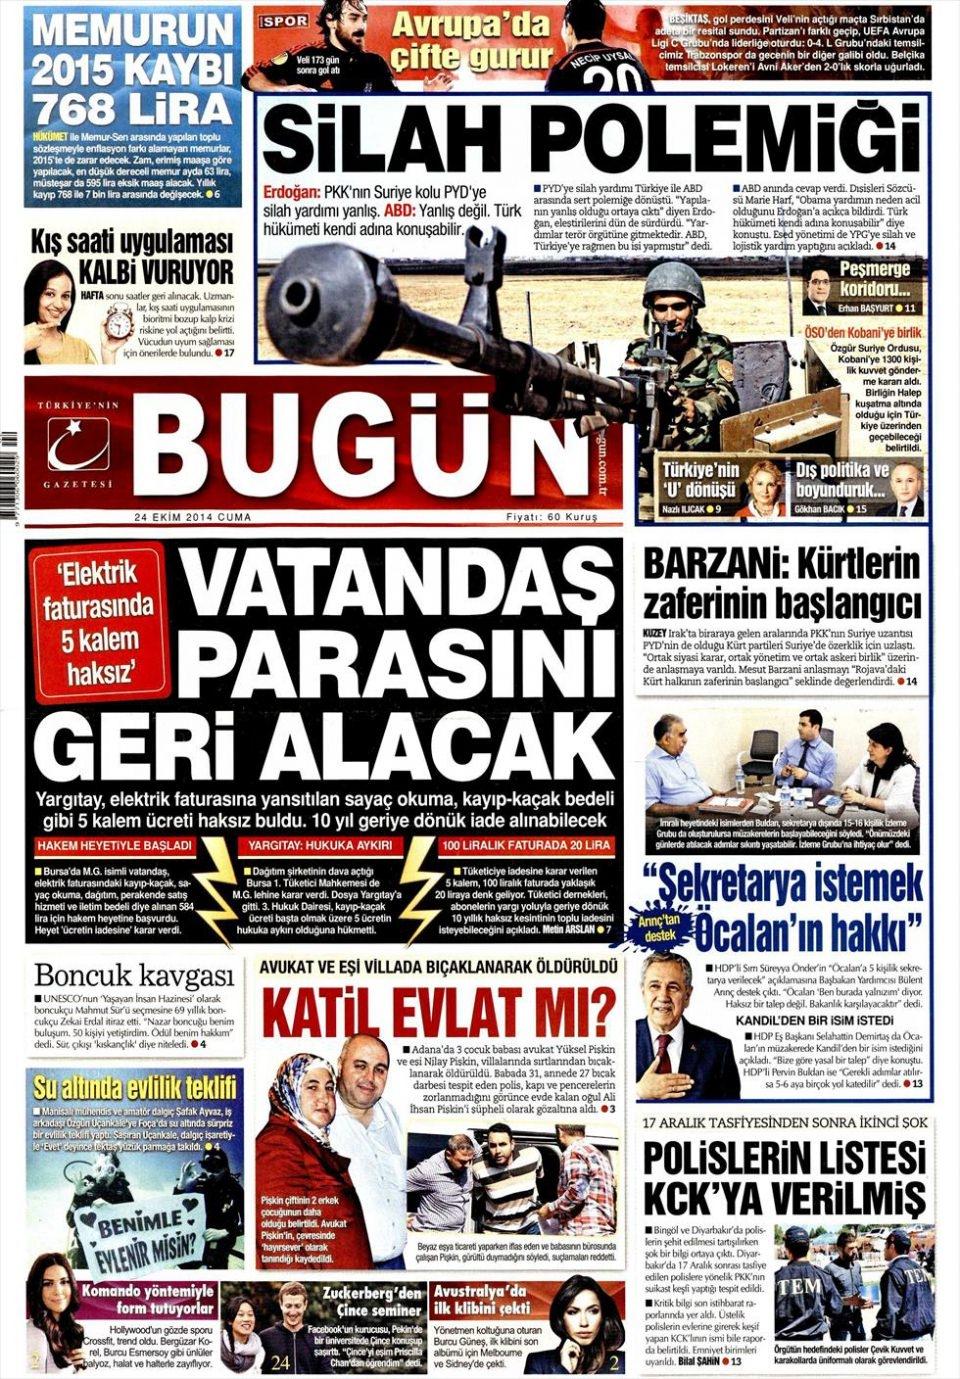 24 Ekim 2014 gazete manşetleri 4